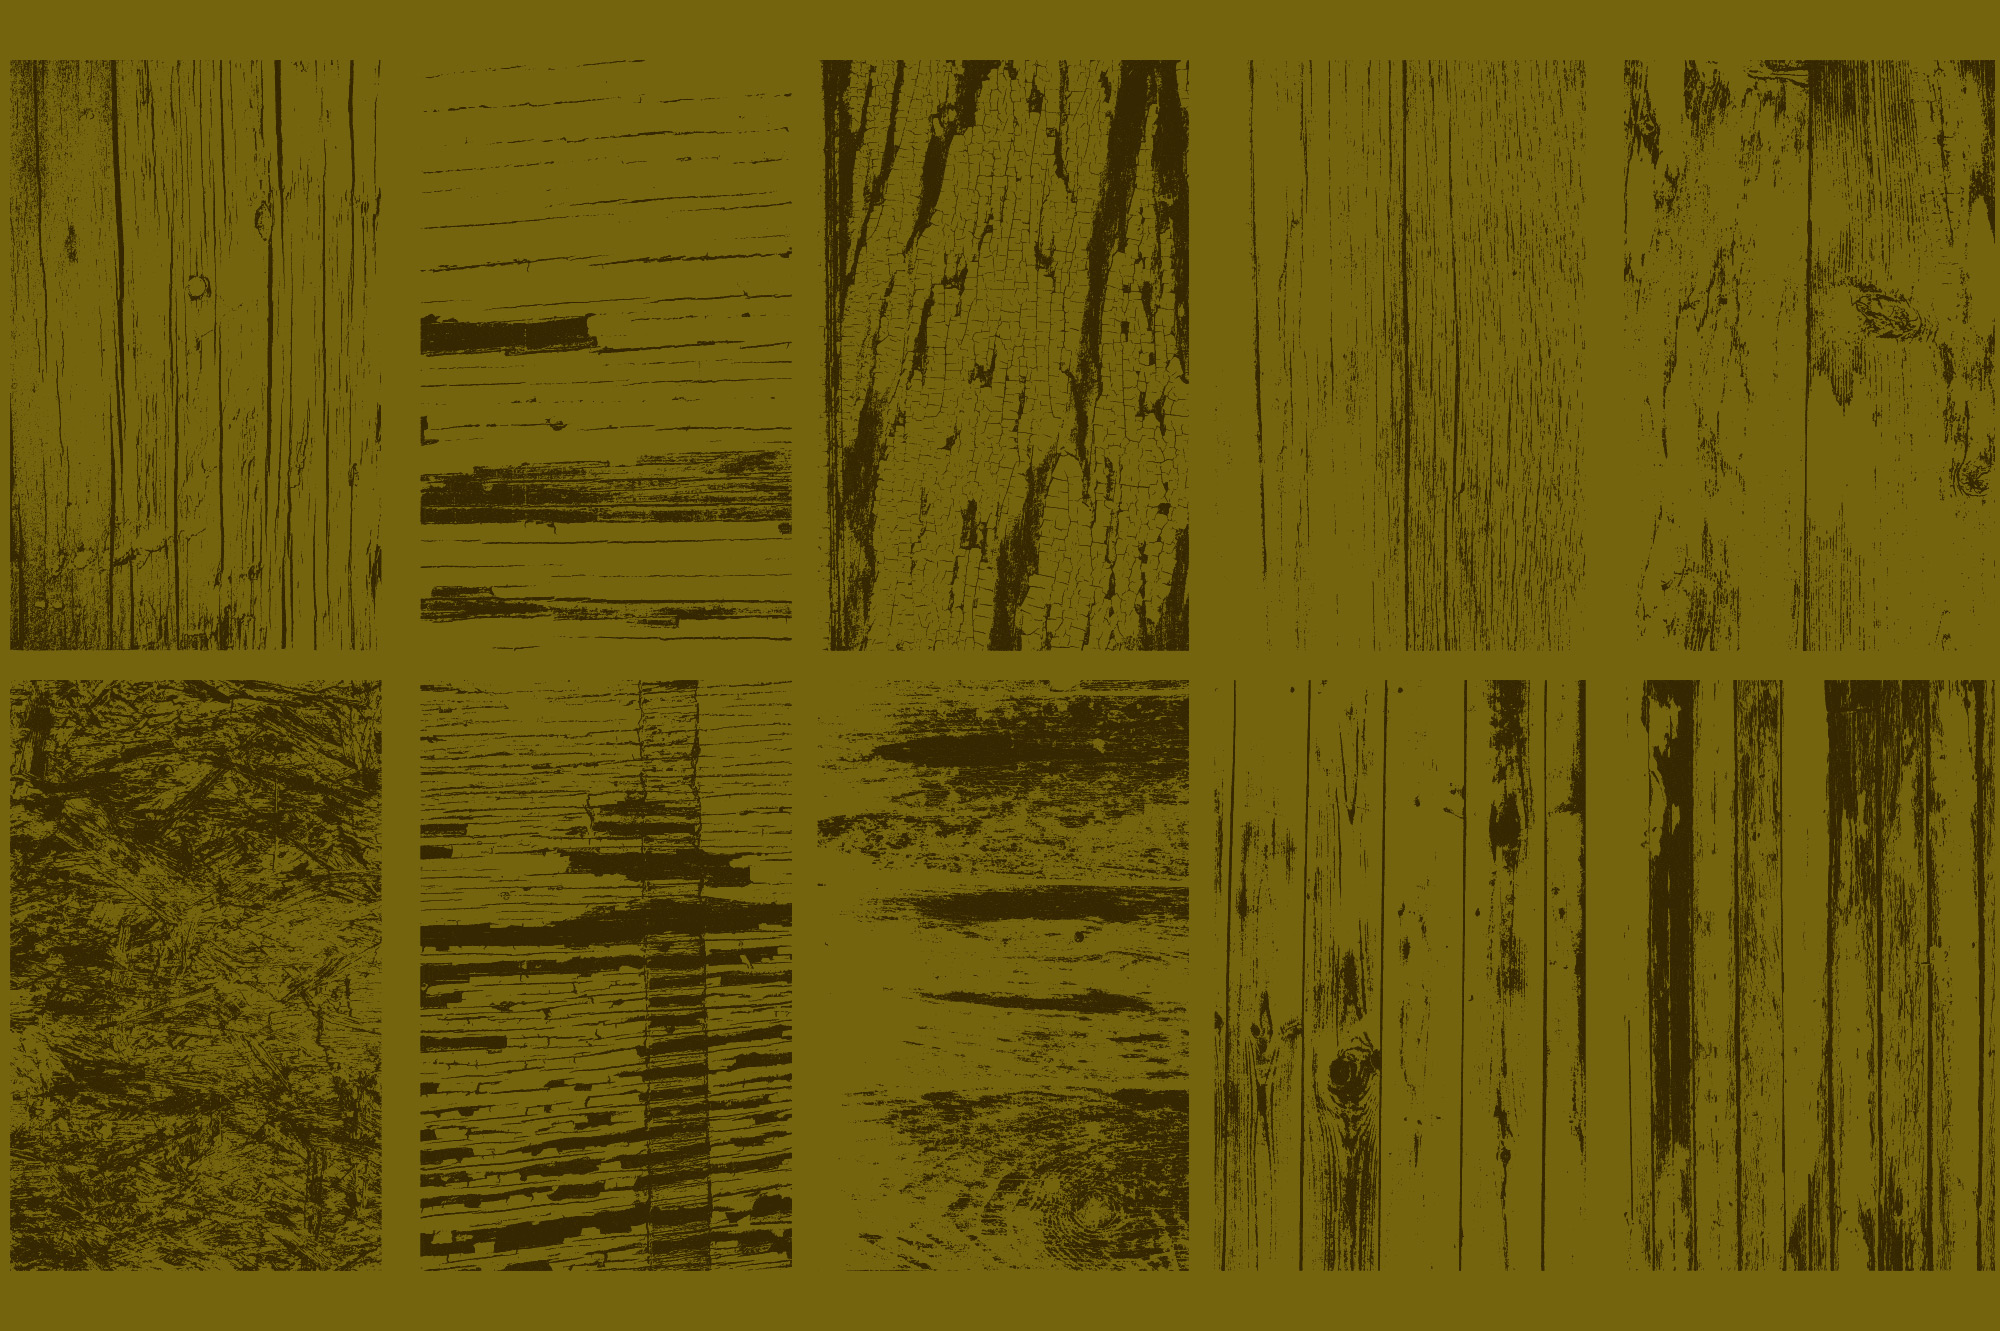 Wood Vol 2 example image 3